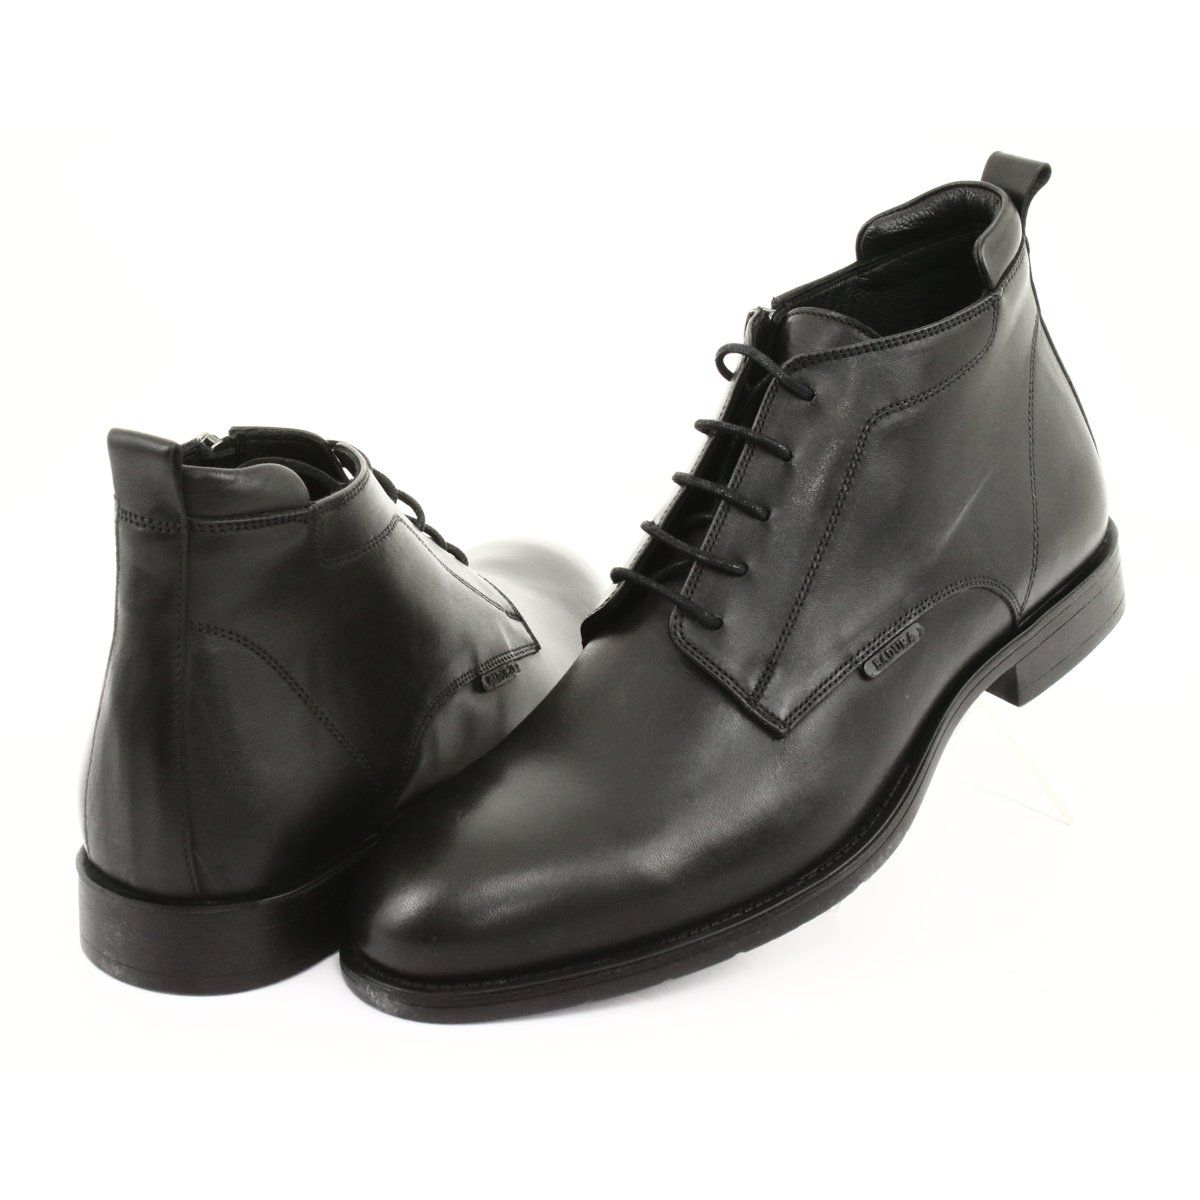 Botki Sztyblety Zimowe Badura 4775 Czarne Winter Boots Chelsea Boots Men Dress Shoes Men